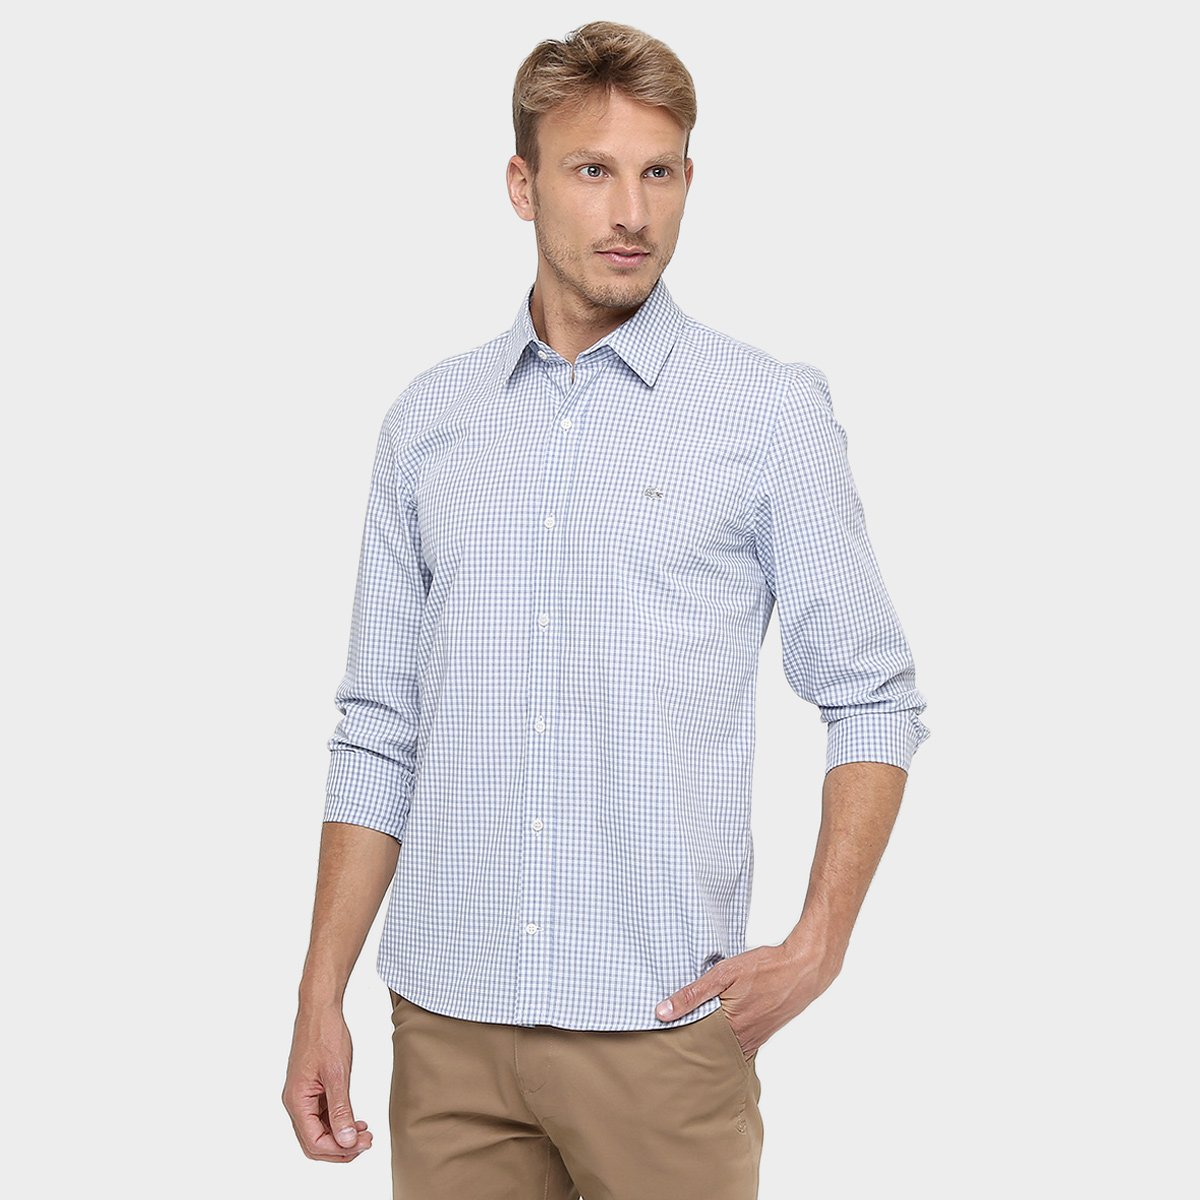 Camisa Lacoste Manga Longa Stretch Mini Xadrez - Compre Agora   Netshoes fe79a6cec7